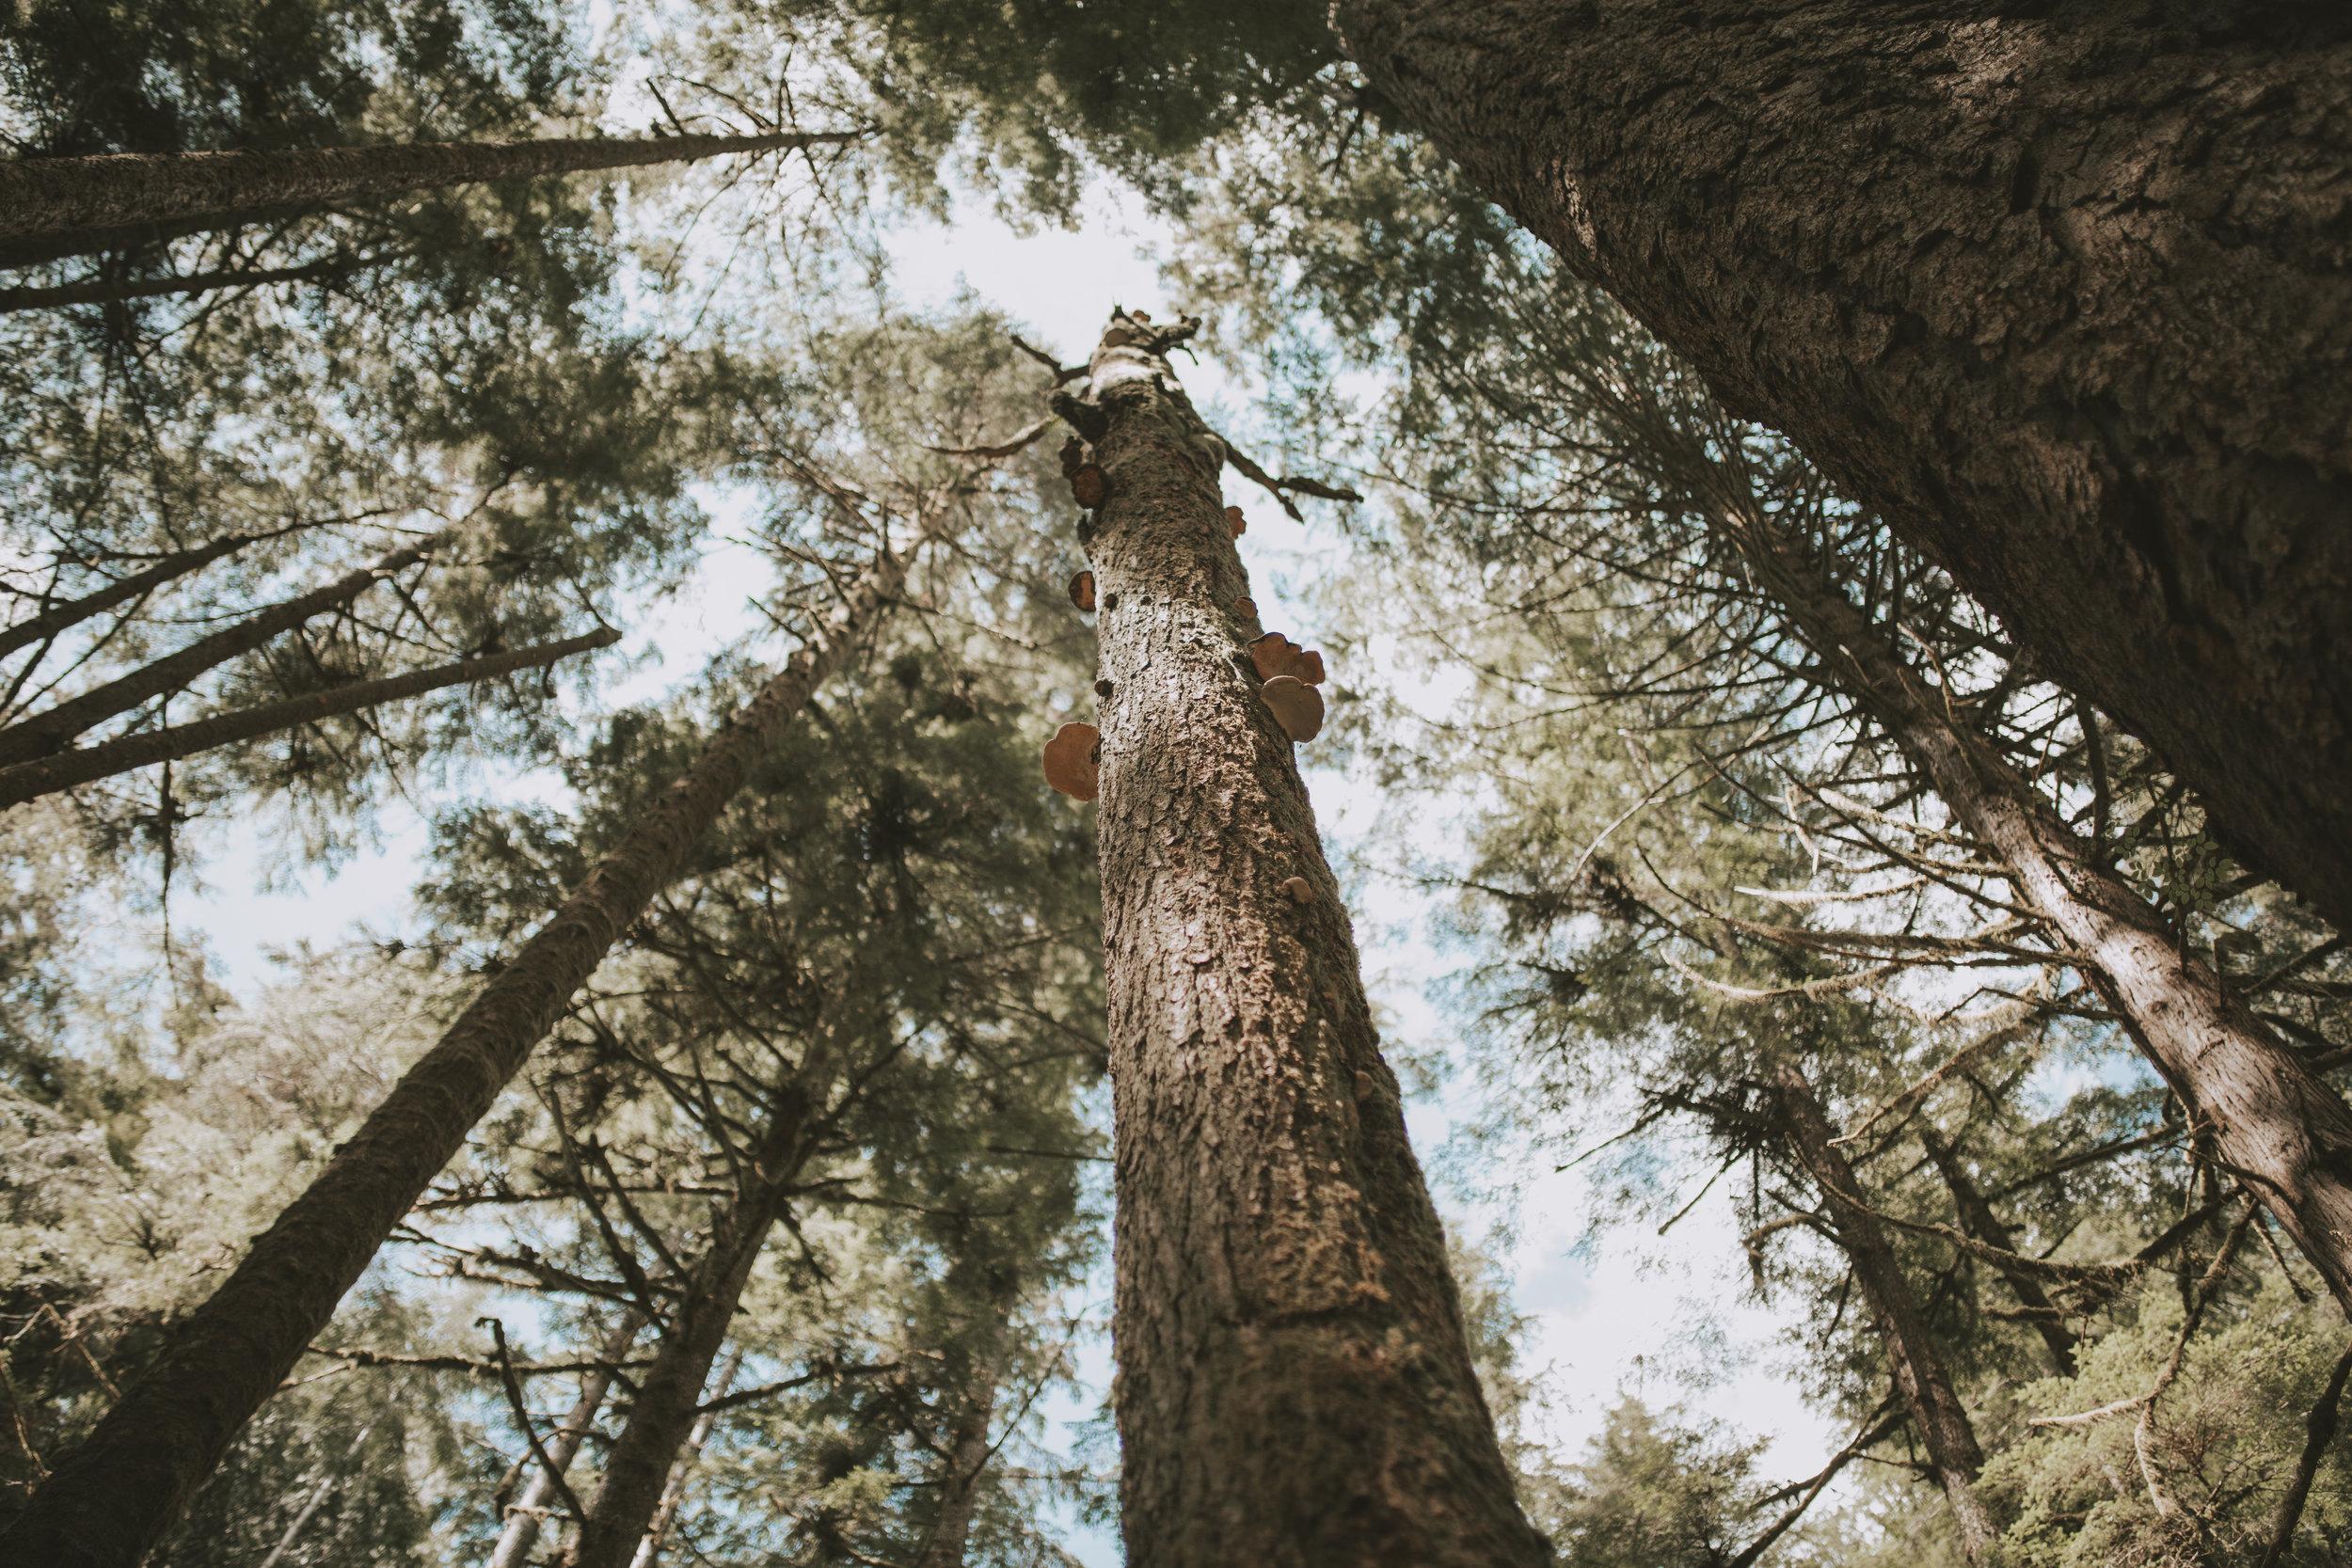 patagonia-2019-emilybeekscreative-14.jpg